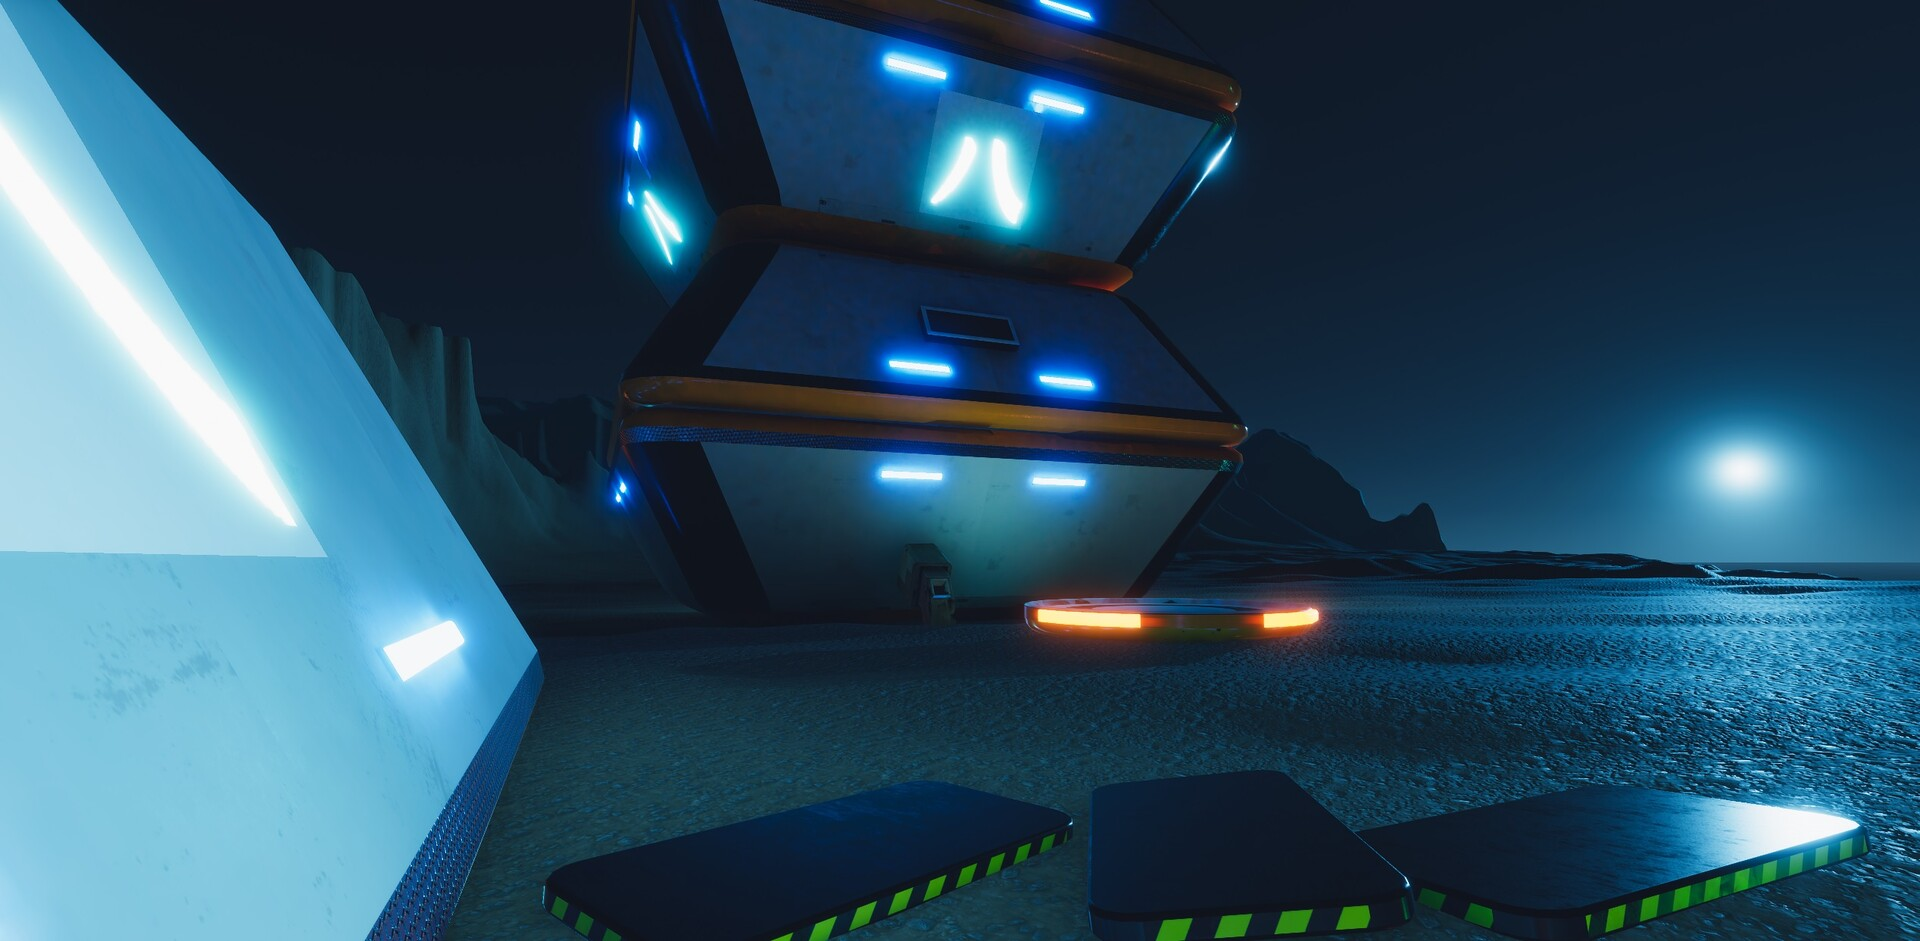 Enrico ottonello screenshot03 sci fi building exterior pack gameartifact